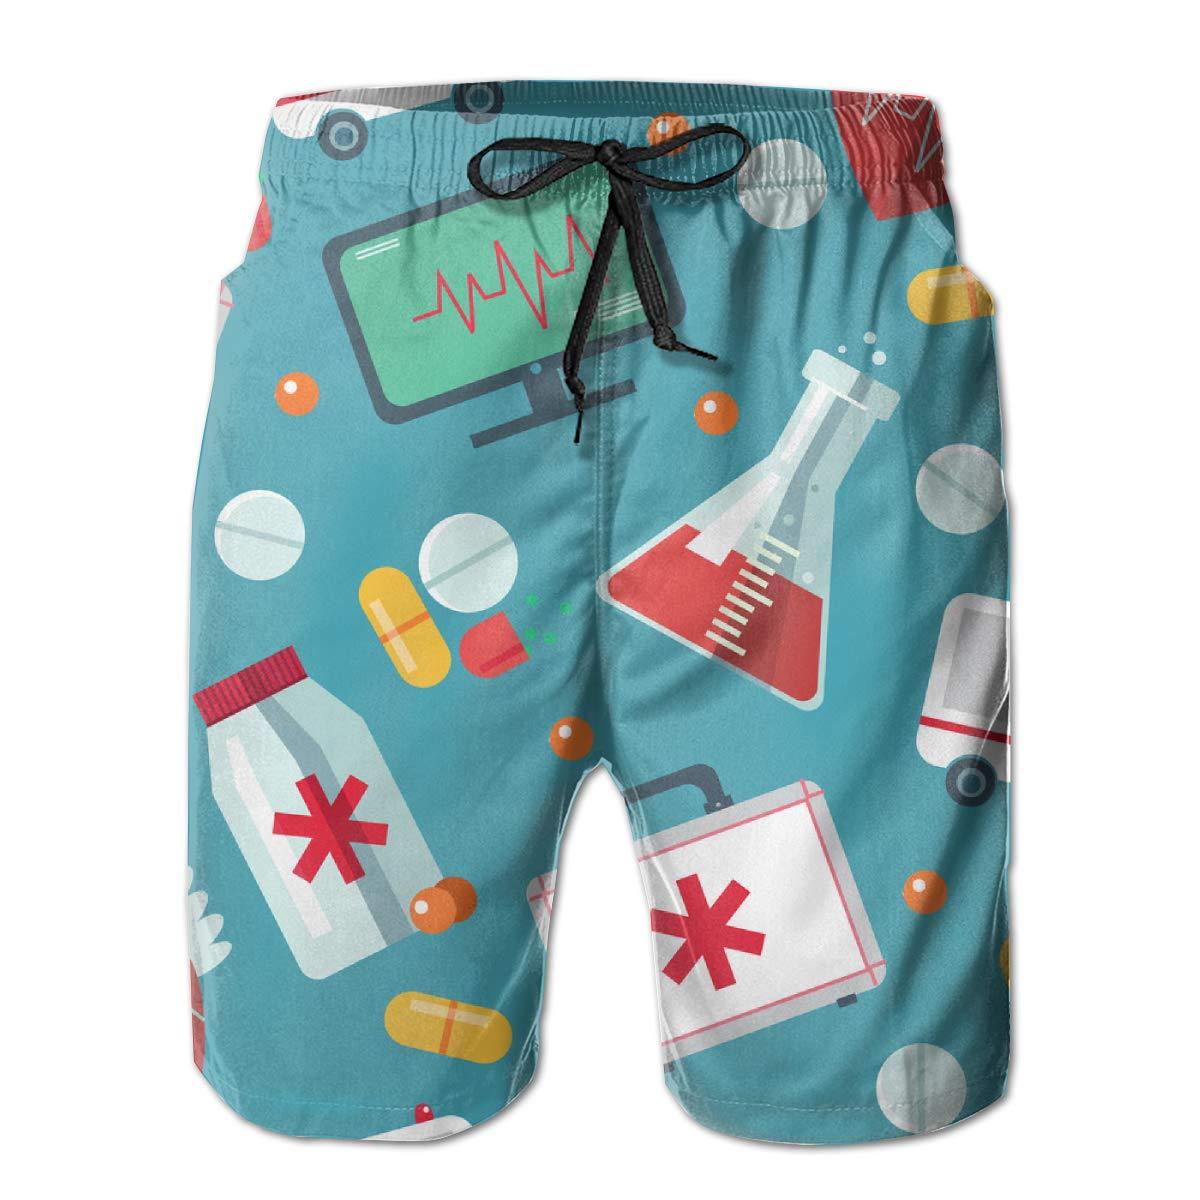 Yt92Pl@00 Mens 100/% Polyester Trendy Flat Medical Beachwear Fashion Board Shorts with Pockets